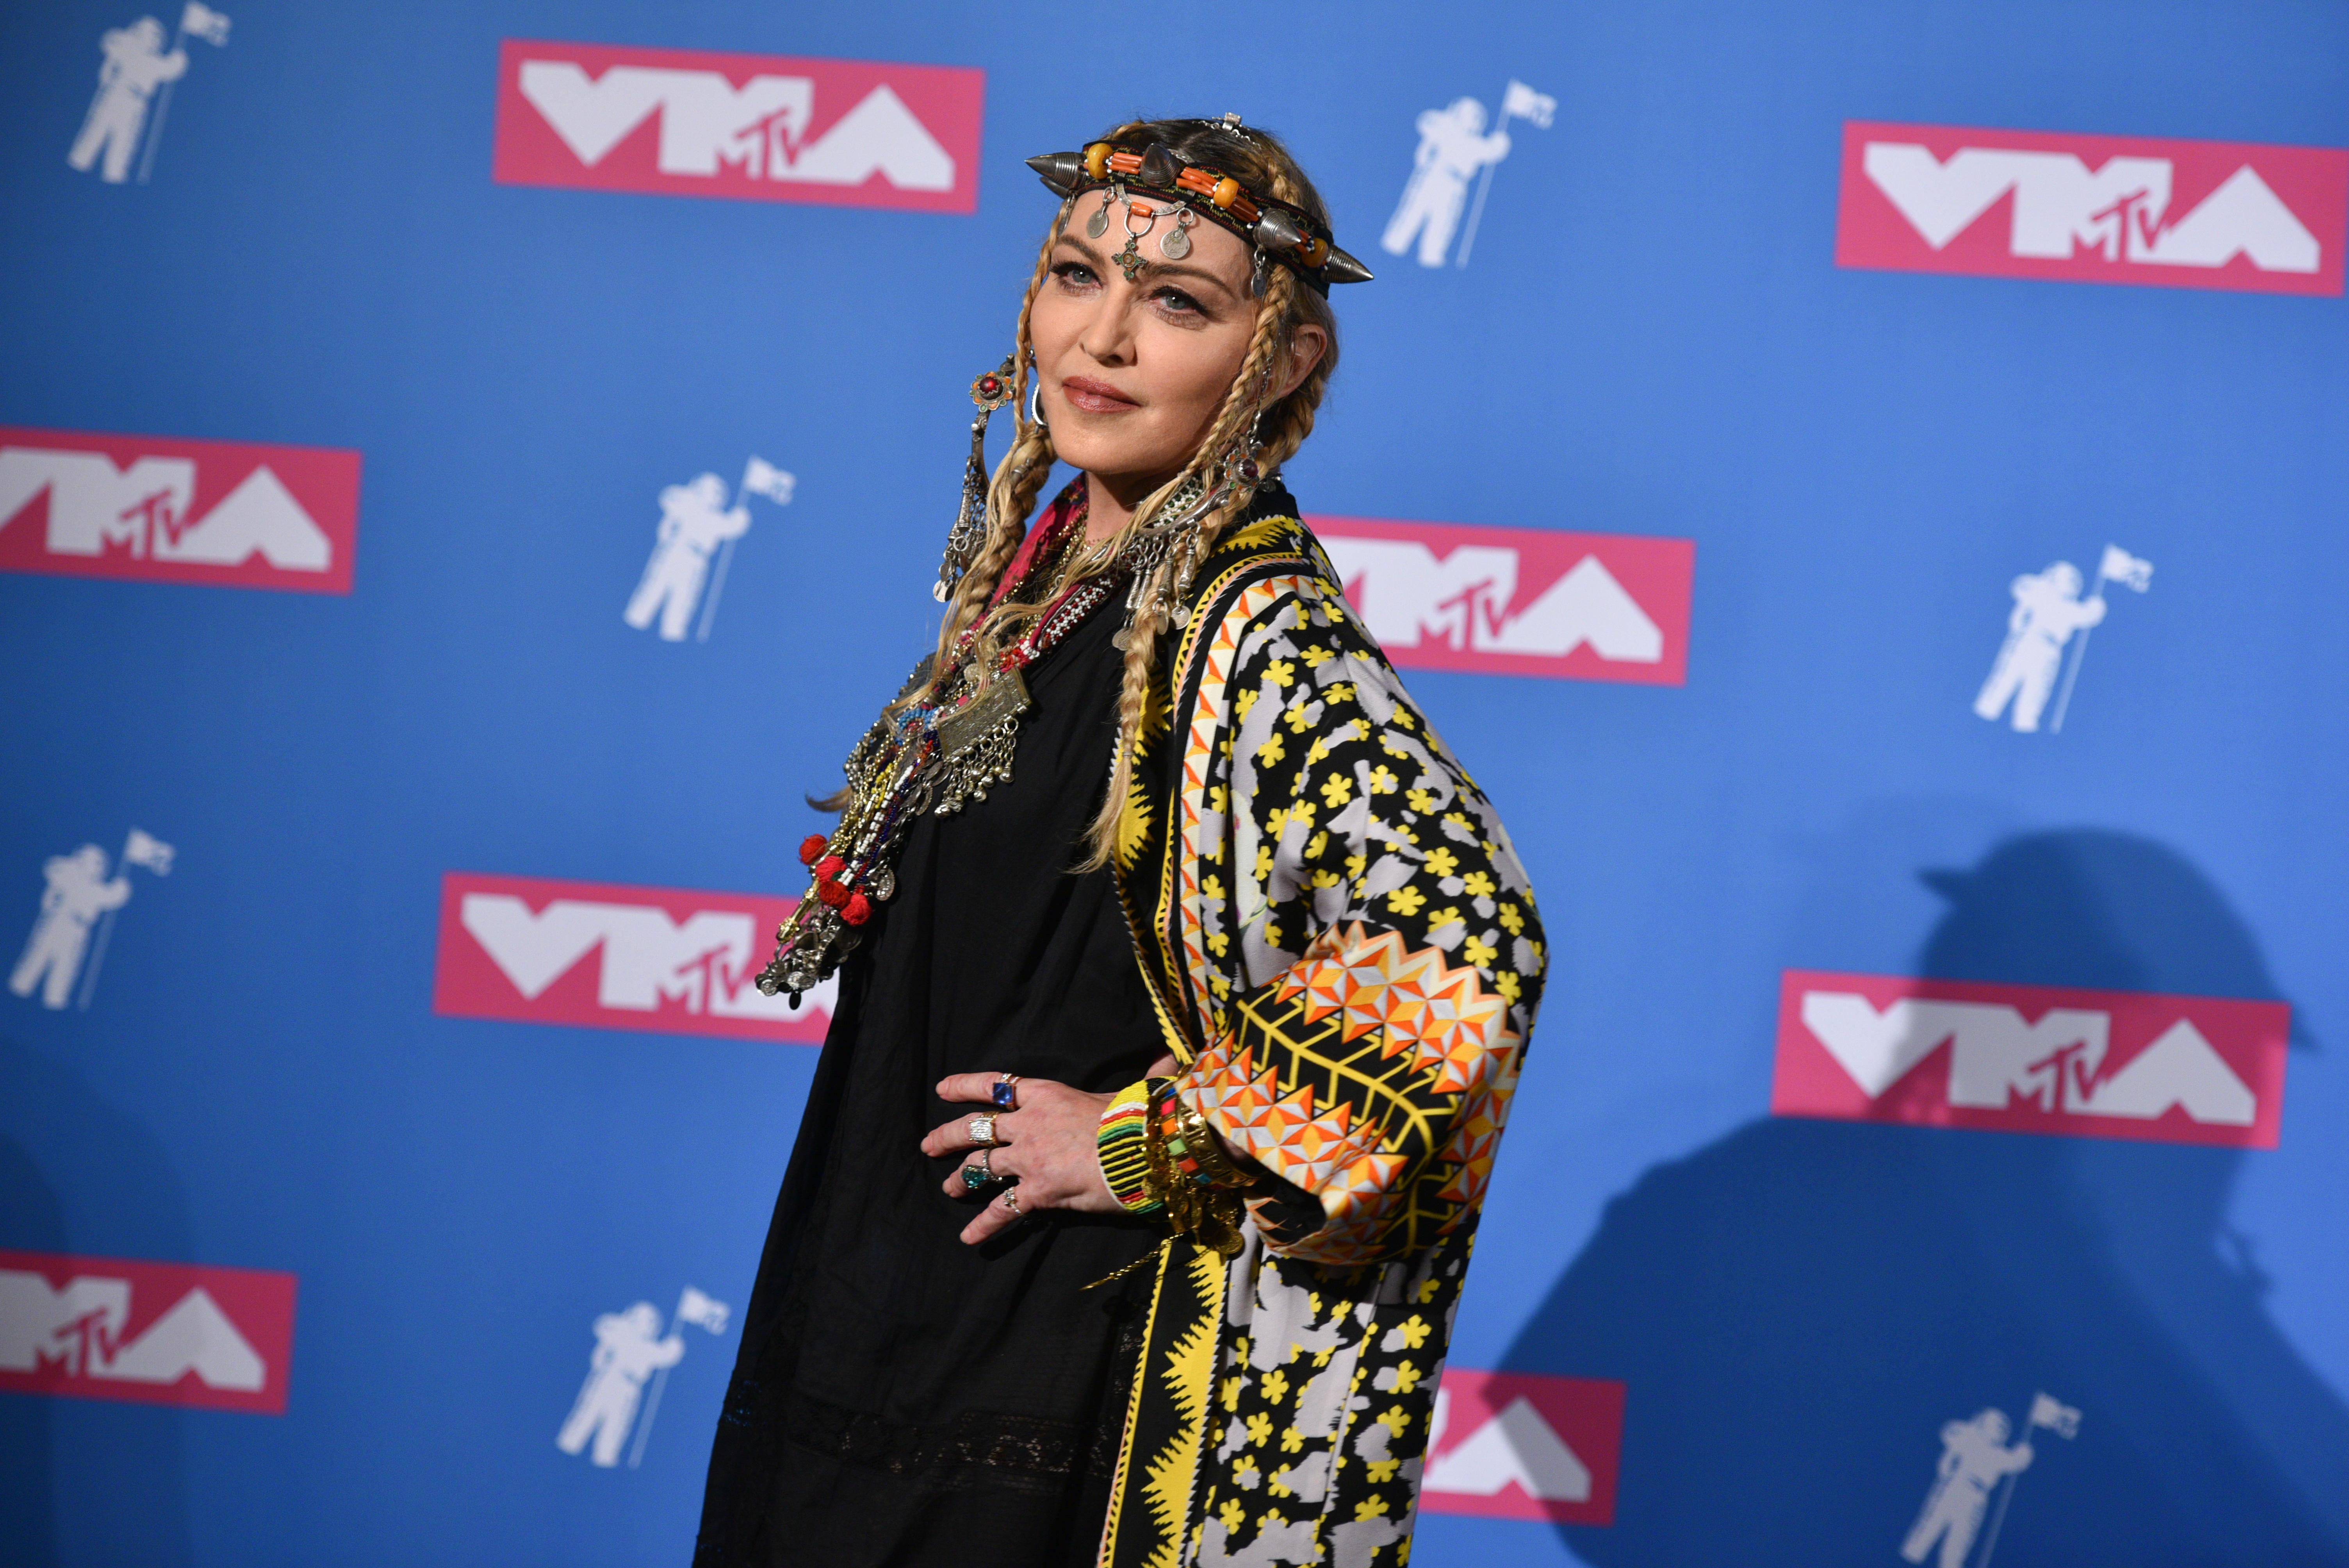 Madonna, Berberkleid, Berber, Bekleidung, MTV Video Music Awards, Uli Rohde, Aktivistin, Bergedorferin, Berber-Bekleidung, Berbermode, kabylisches Kleid, Kabylen, News, Bergedorfer Blog, HEIDI VOM LANDE